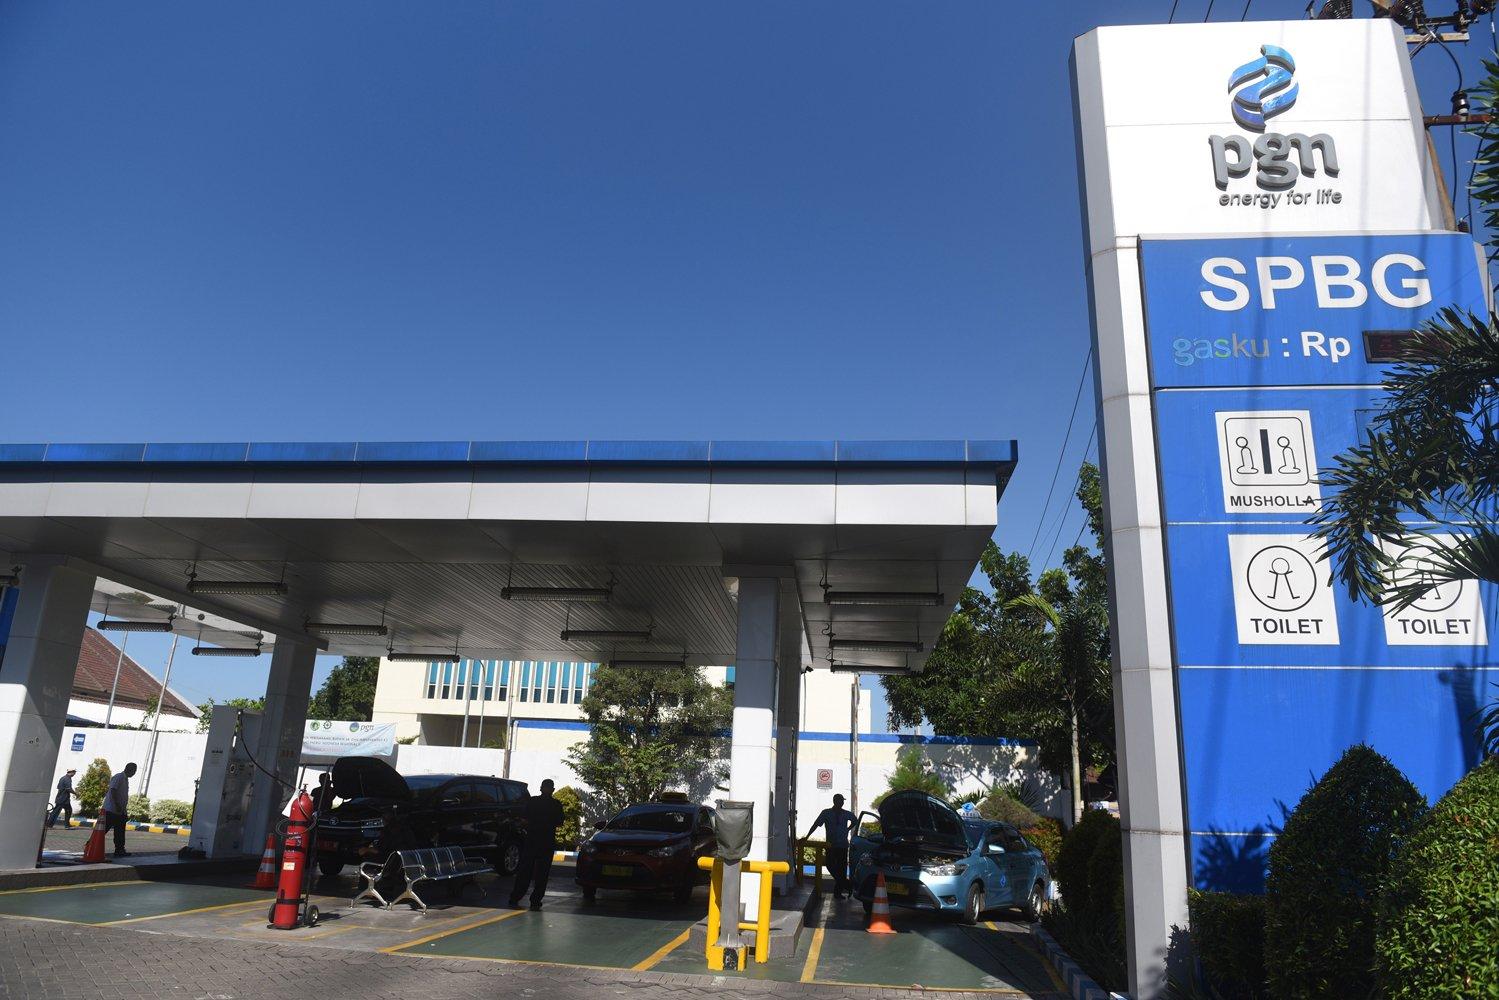 Petugas mengisi bahan bakar gas untuk kendaraan umum di stasiun pengisian bahan bakar gas (SPBG) PGN di Surabaya, Jawa Timur.